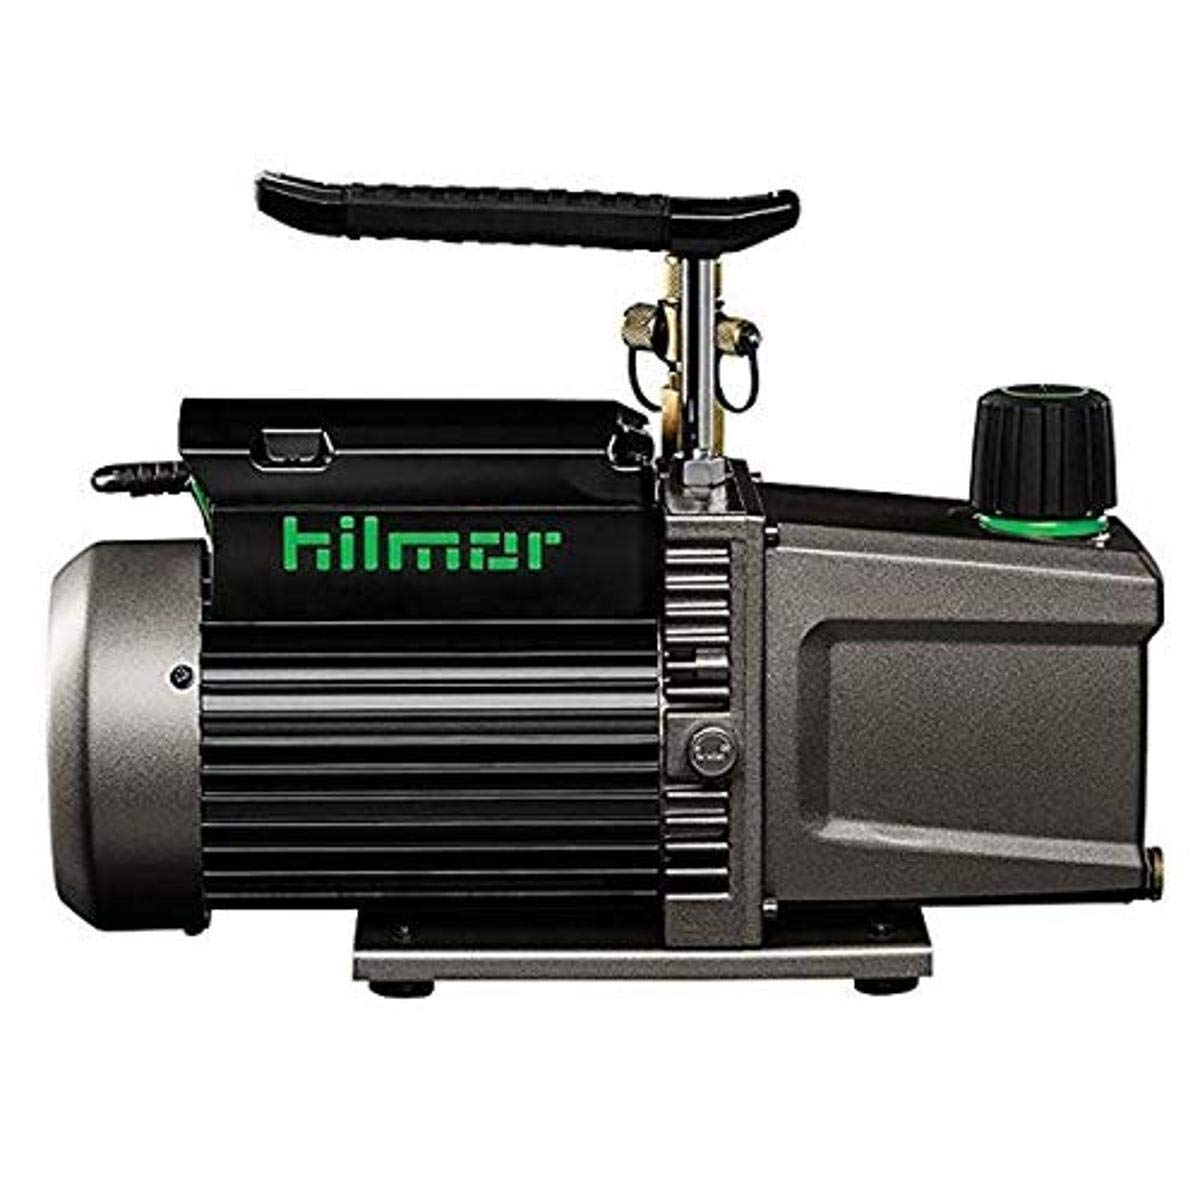 Lennox 1948122 Hilmor Vacuum Pump, 9 Cfm, 1 hp, 120V, 60 Hz